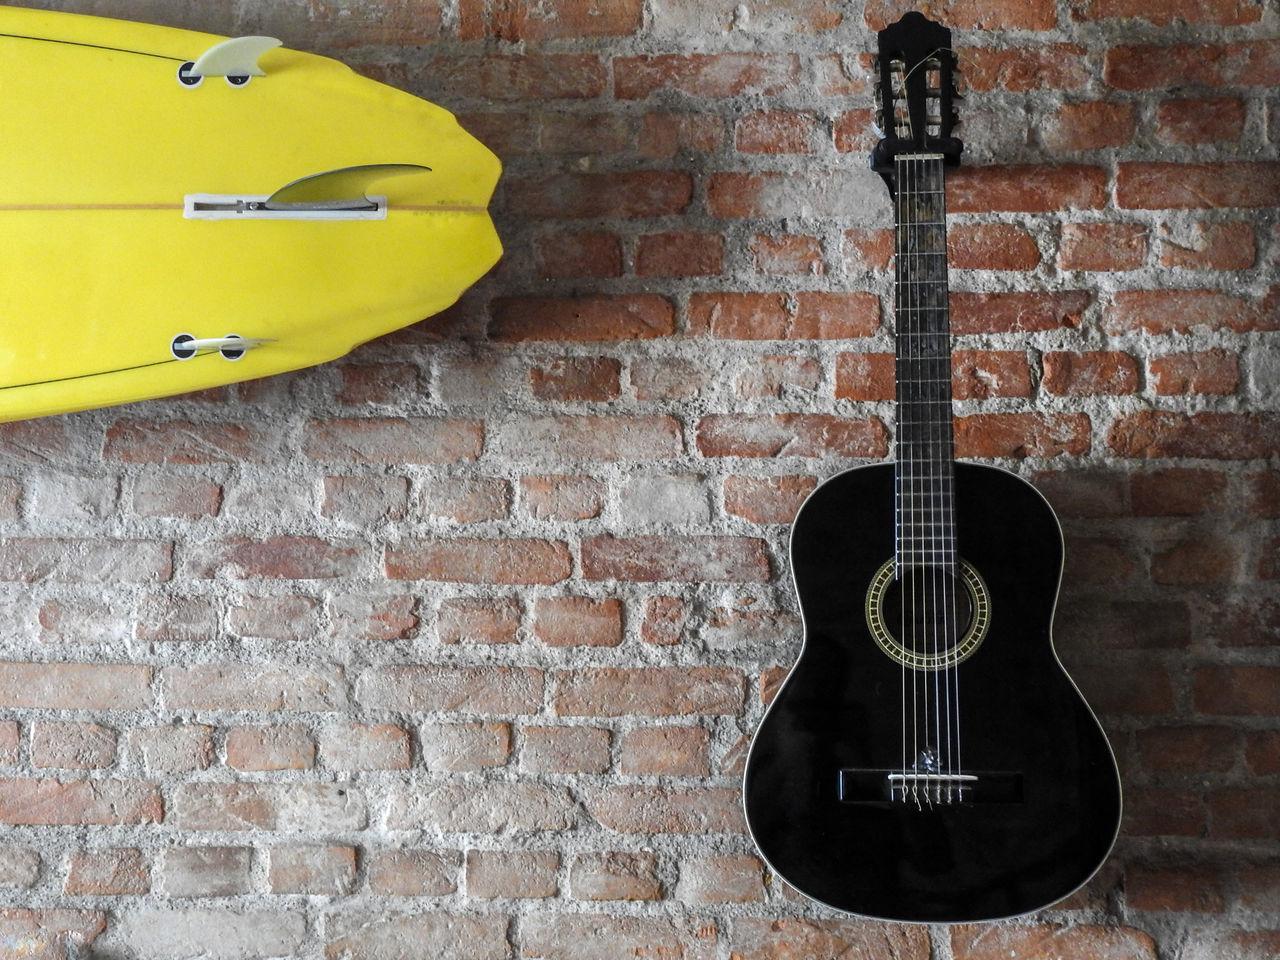 Beautiful stock photos of gitarre, Arts Culture And Entertainment, Brazil, Brick Wall, Day